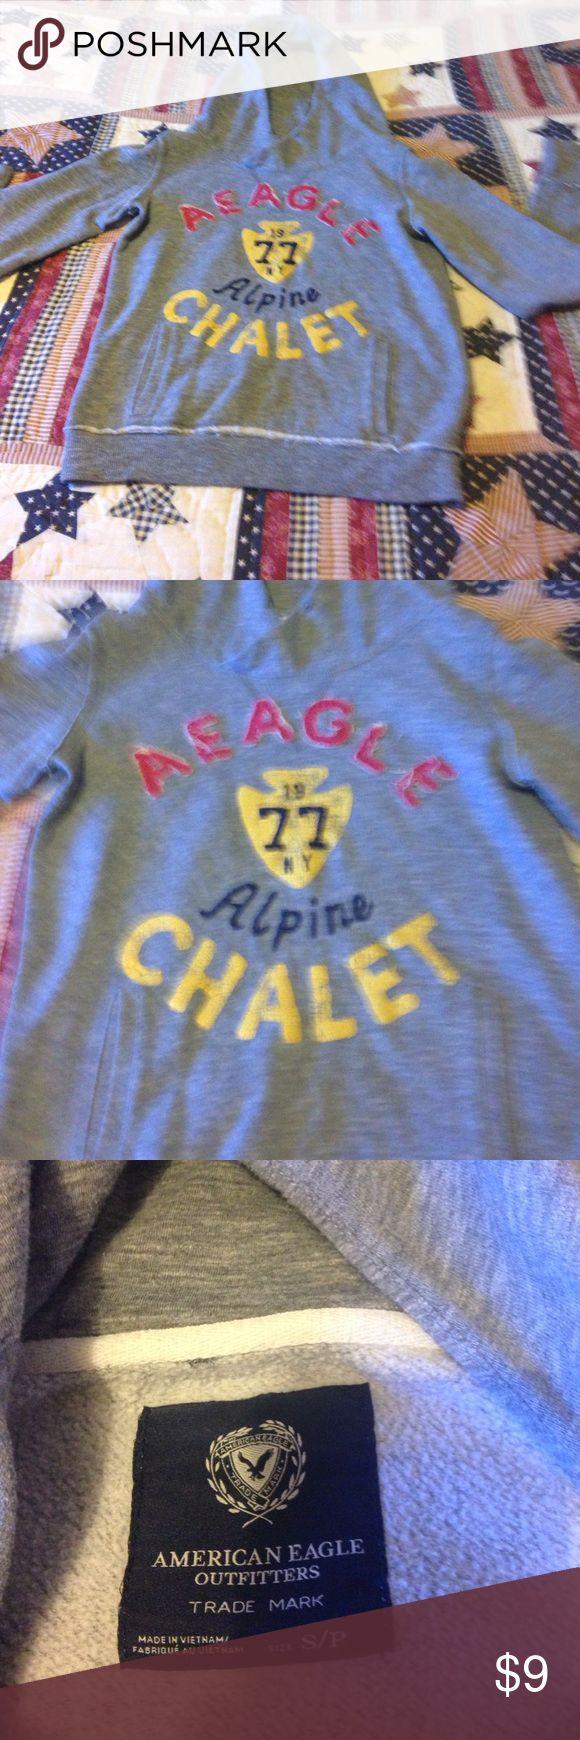 Size small American eagle sweatshirt Size small American eagle sweatshirt! Good used condition! Smoker American Eagle Outfitters Tops Sweatshirts & Hoodies